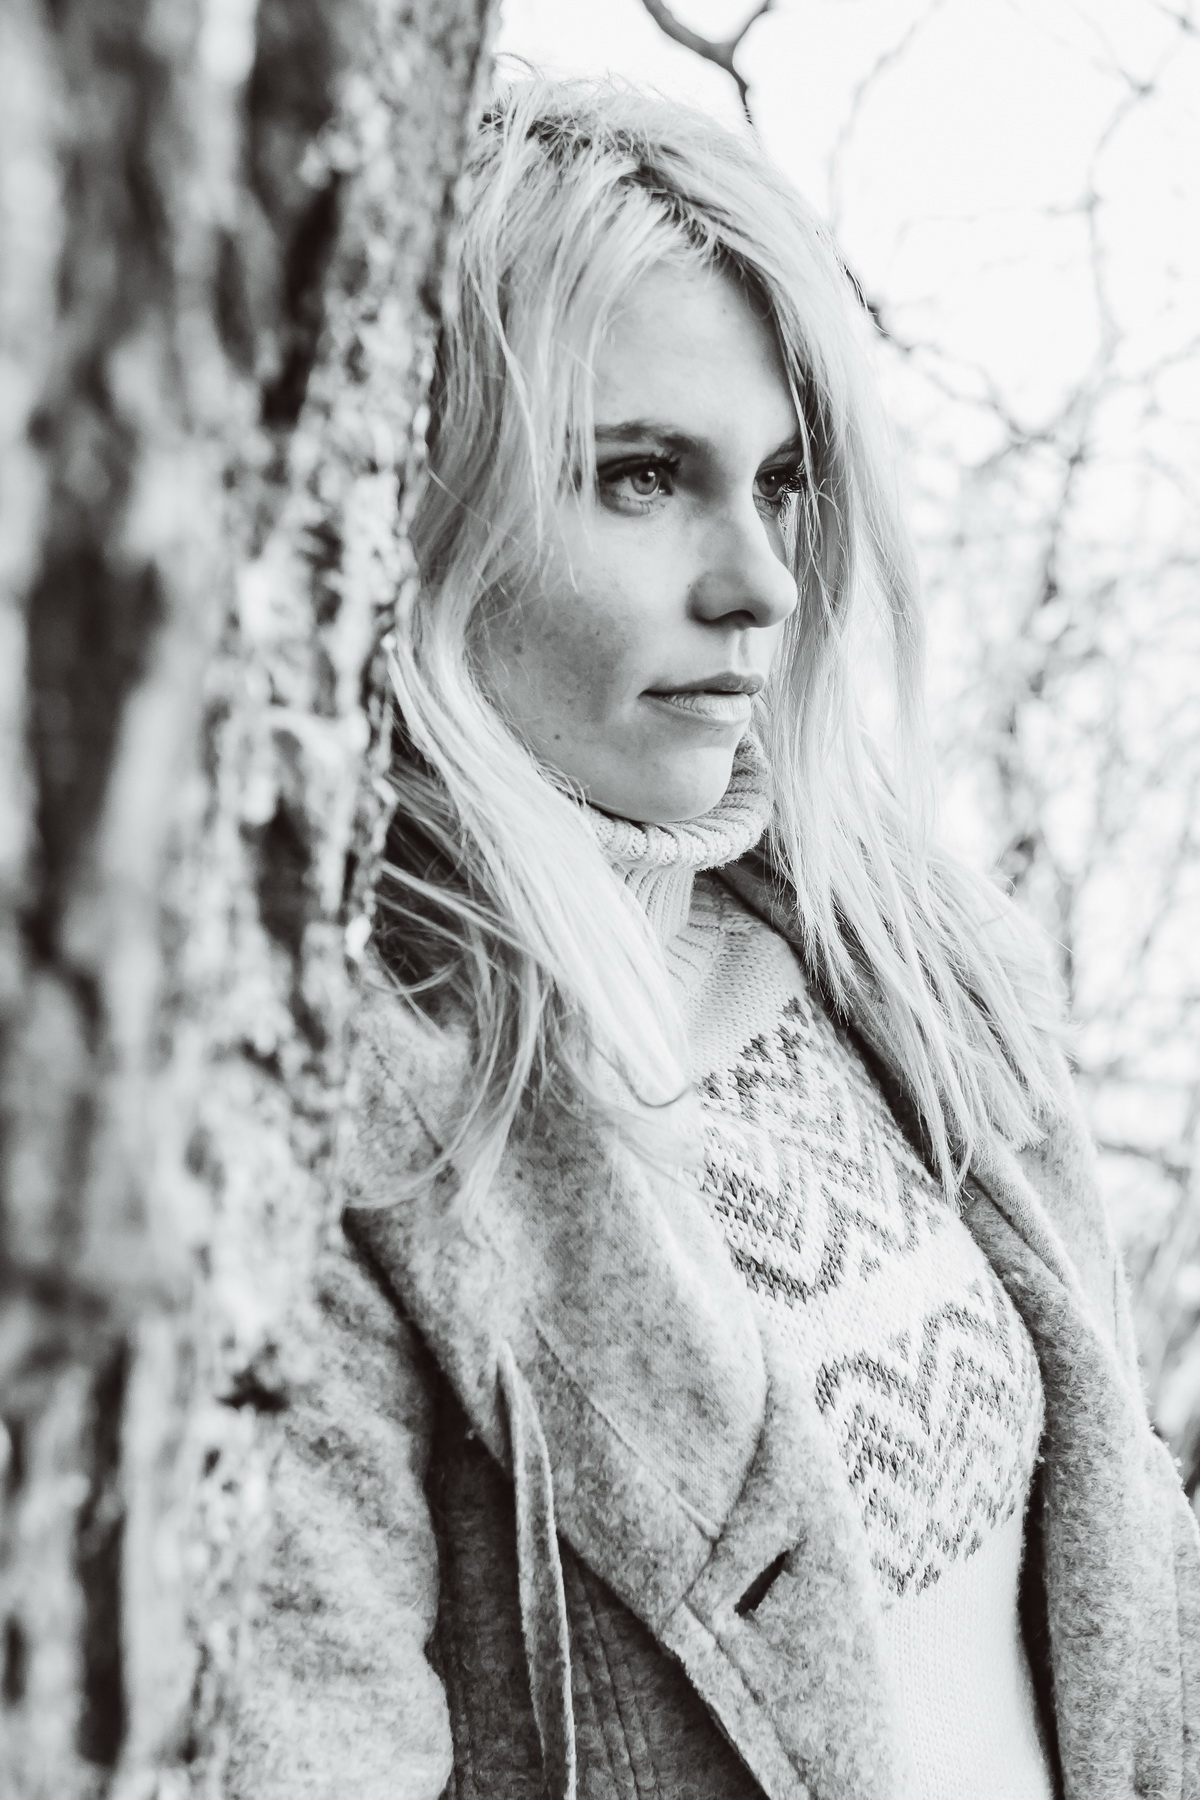 Loveshoot - Julia und Stefan - Claudia Sittig Photography - Lake Ammersee DX0B2543-2-3